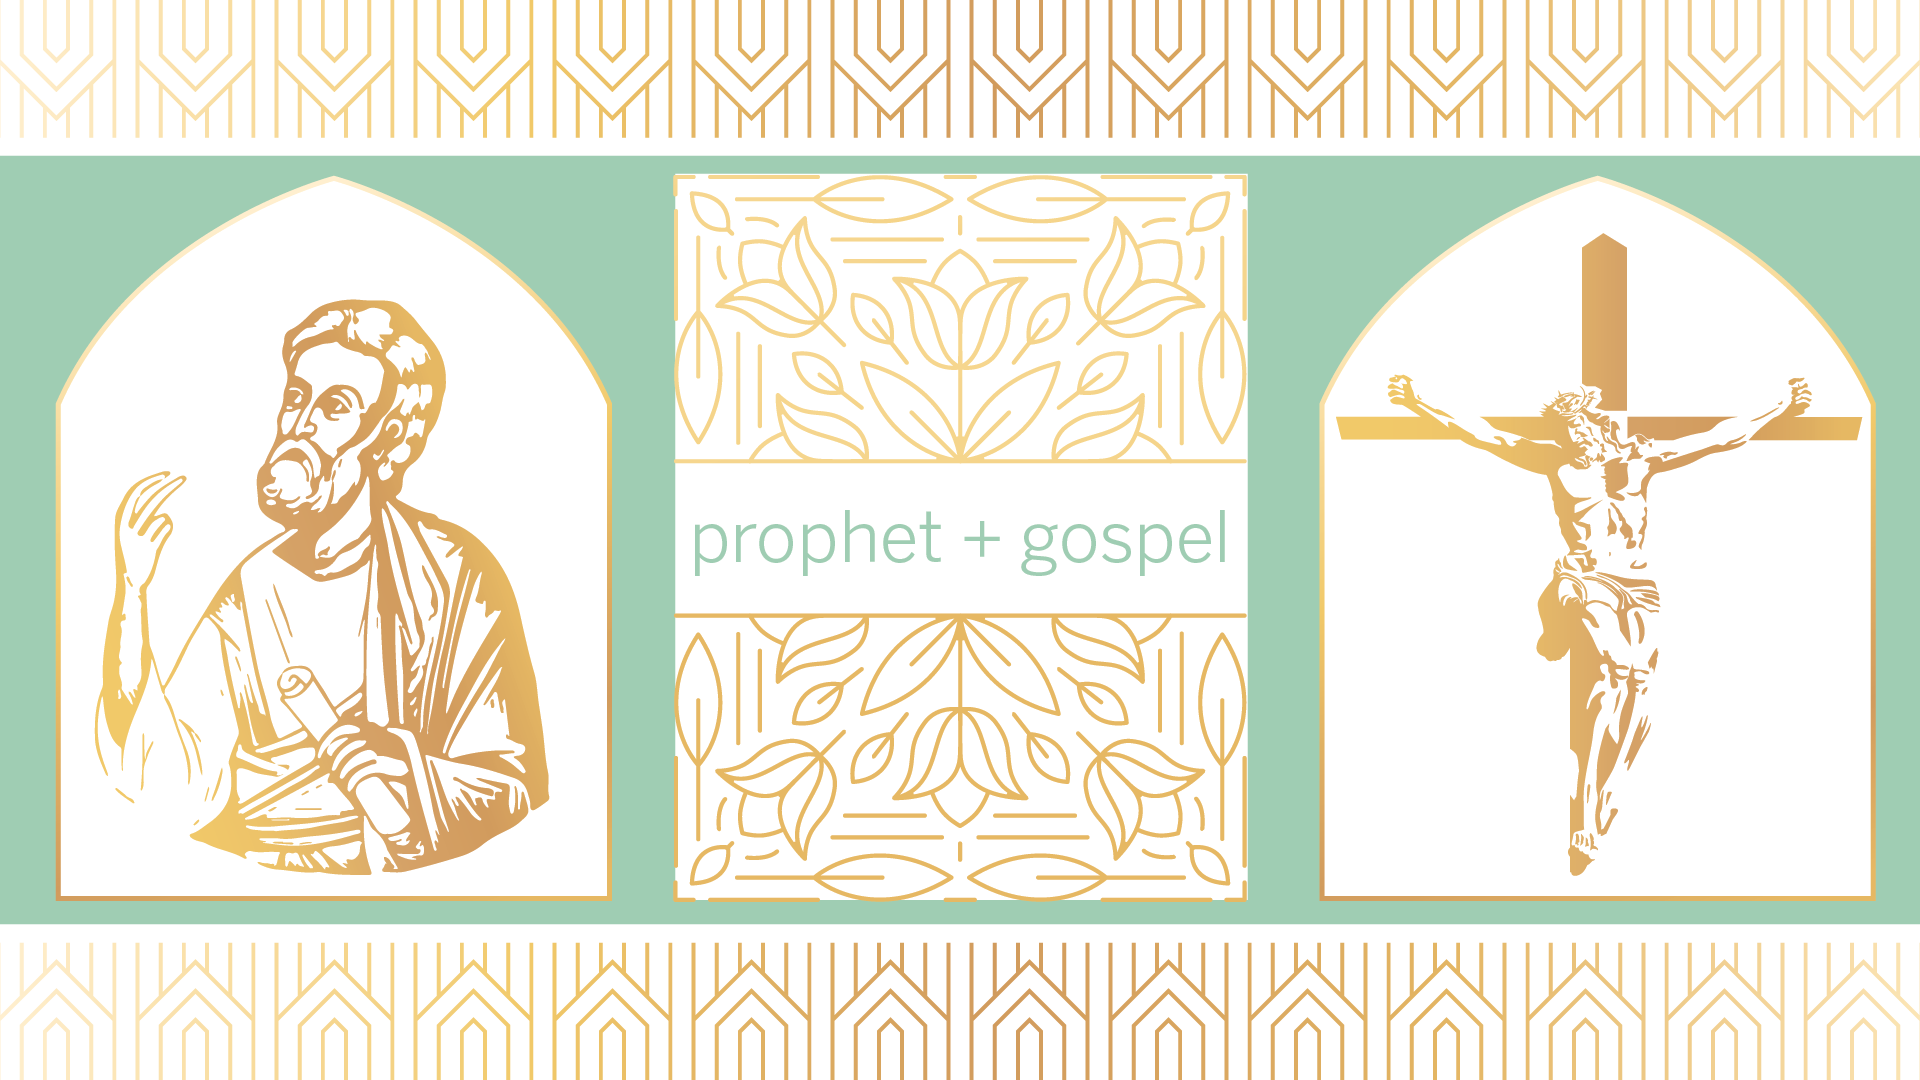 prophetgospel_a